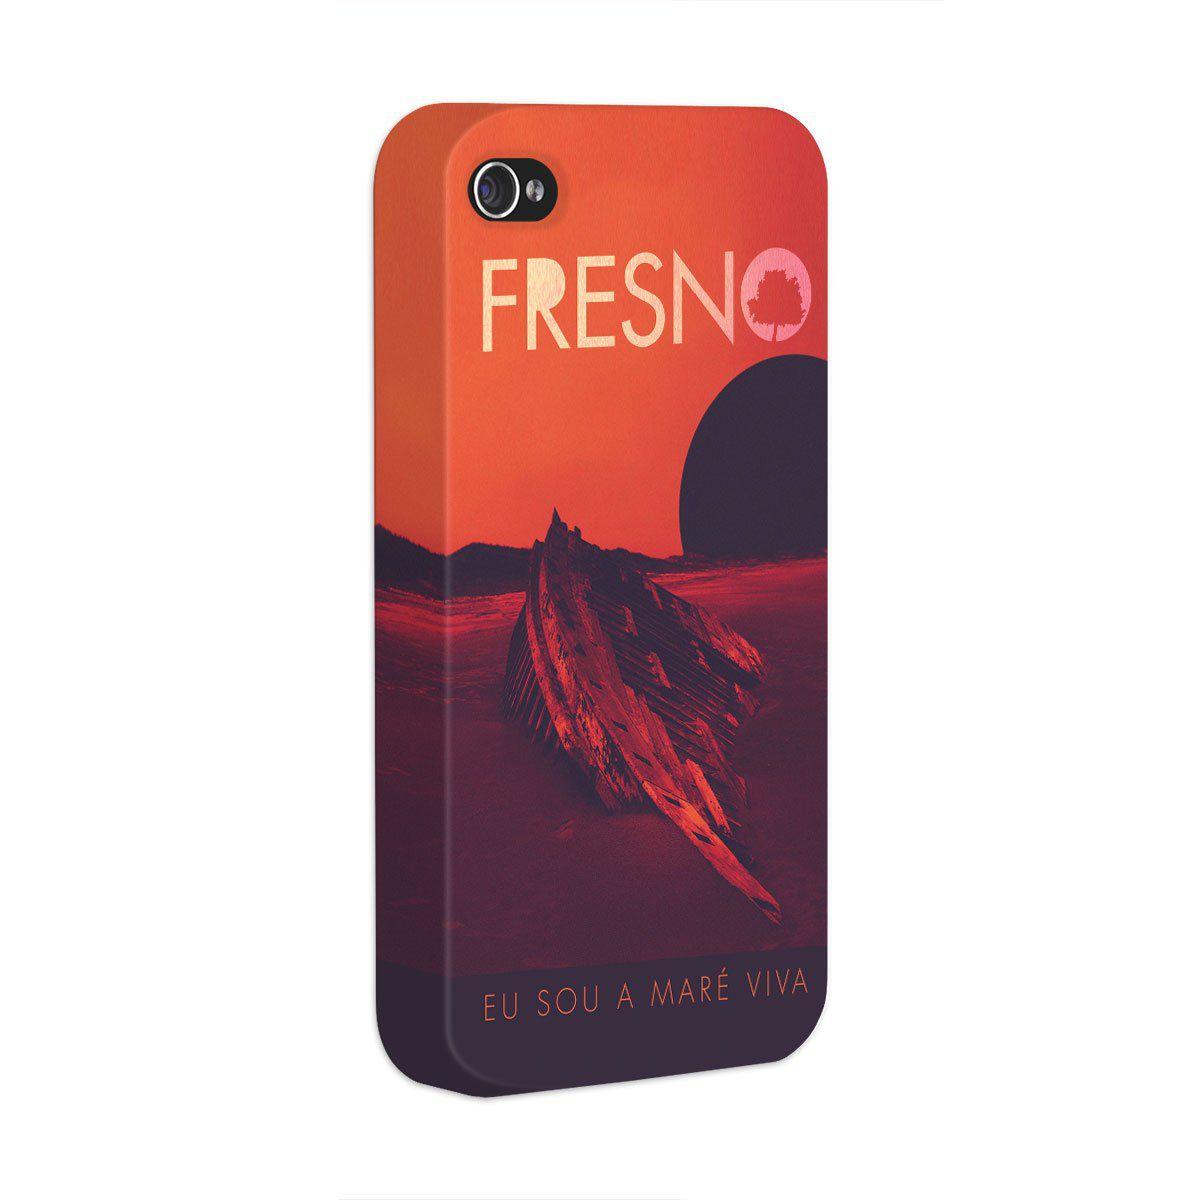 Capa para iPhone 4/4S Fresno - Capa EP